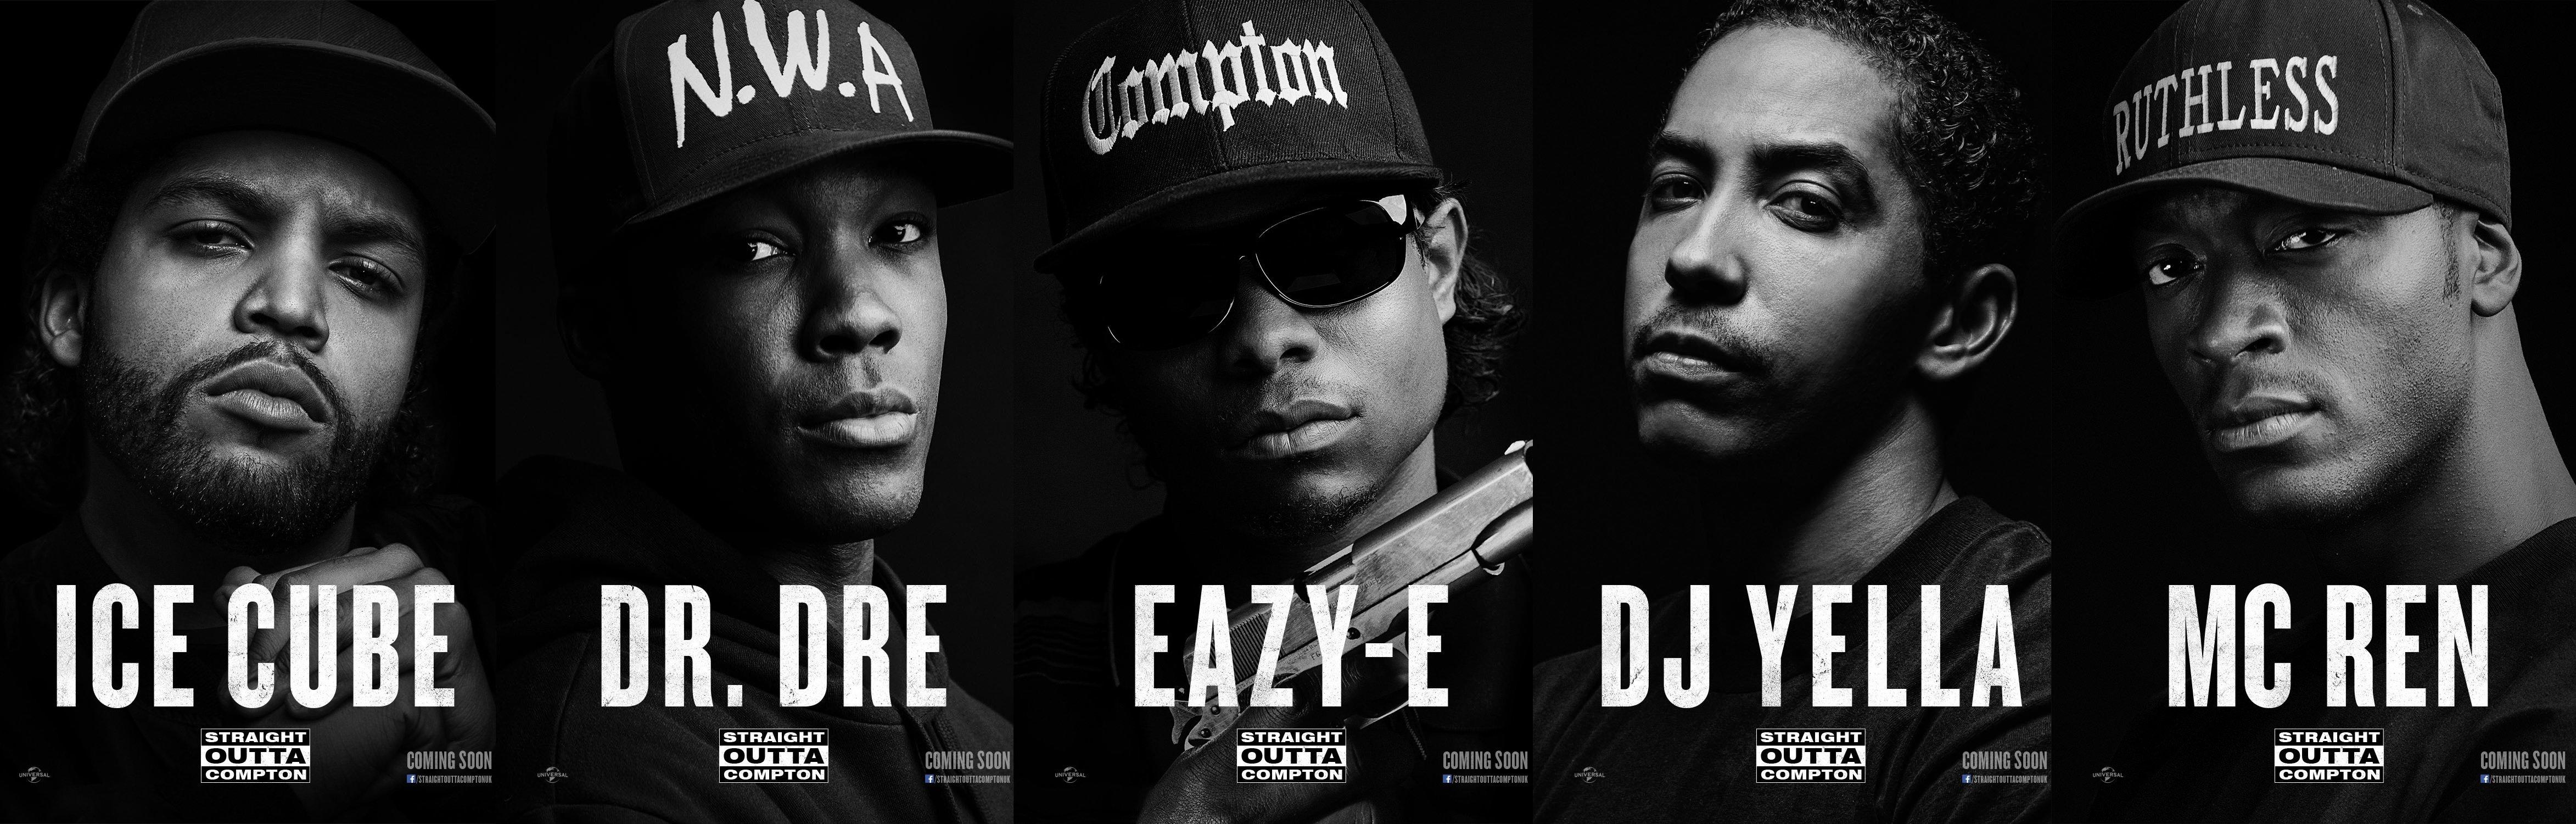 STRAIGHT OUTTA COMPTON rap rapper hip hop gangsta nwa 4692x1500